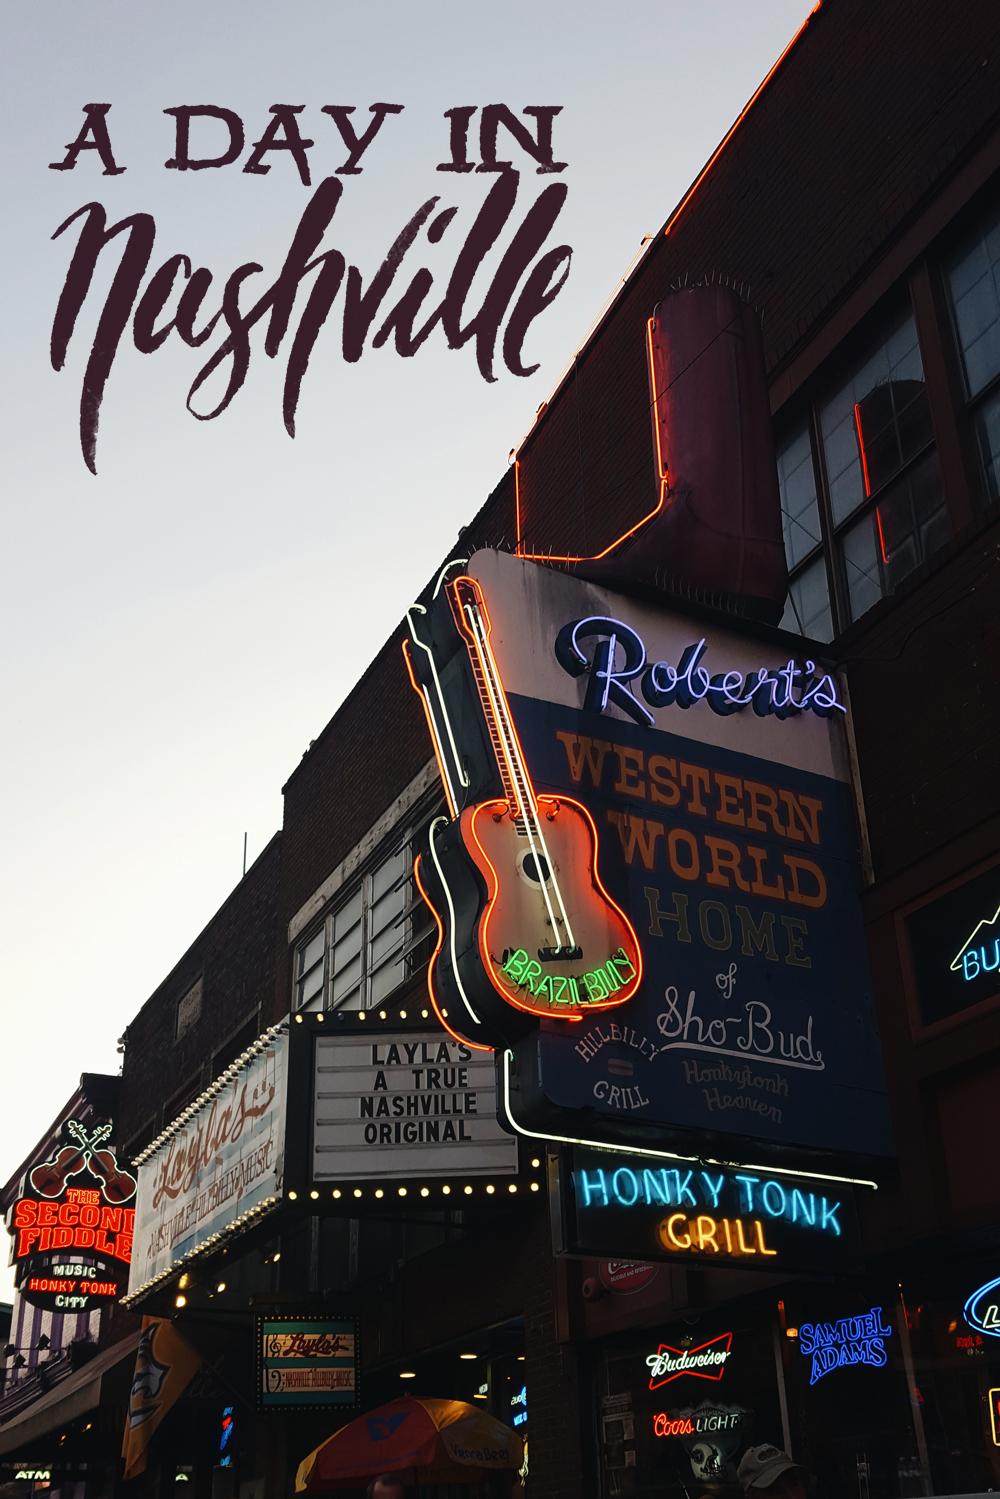 broadway-nashville-music-robert-western-world-honky-tonk